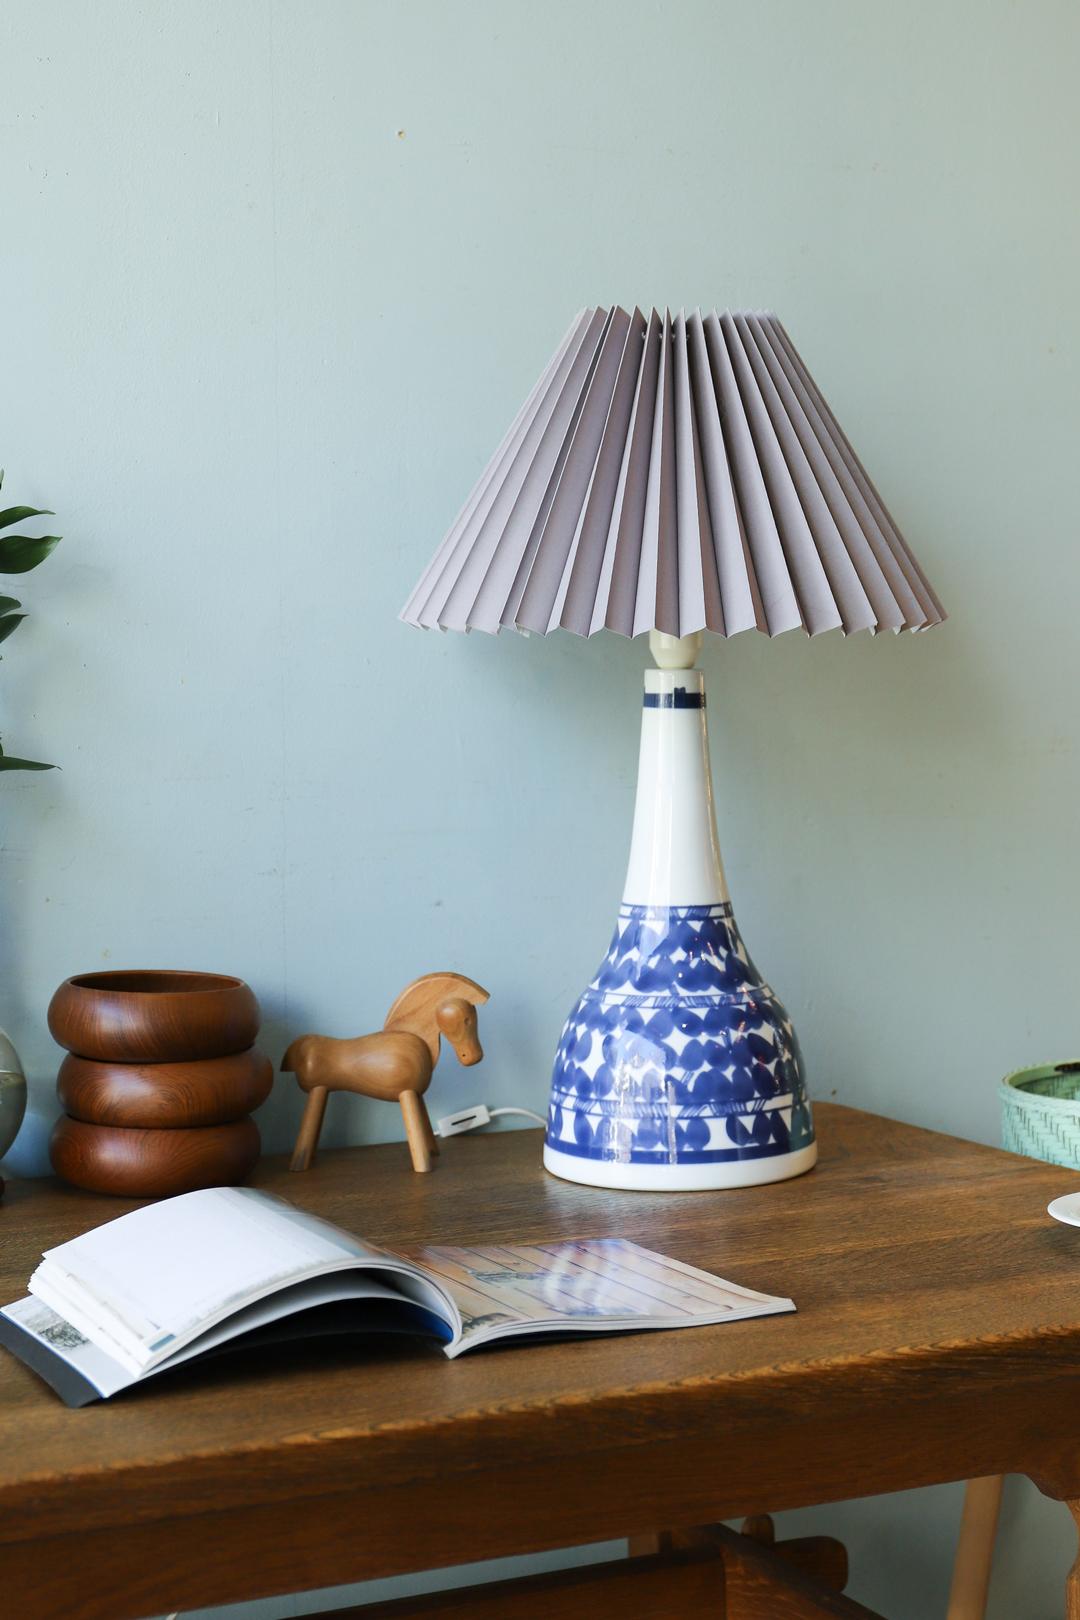 Scandinavian Vintage Pottery Table Lamp/北欧ヴィンテージ テーブルランプ 陶器 照明 インテリア